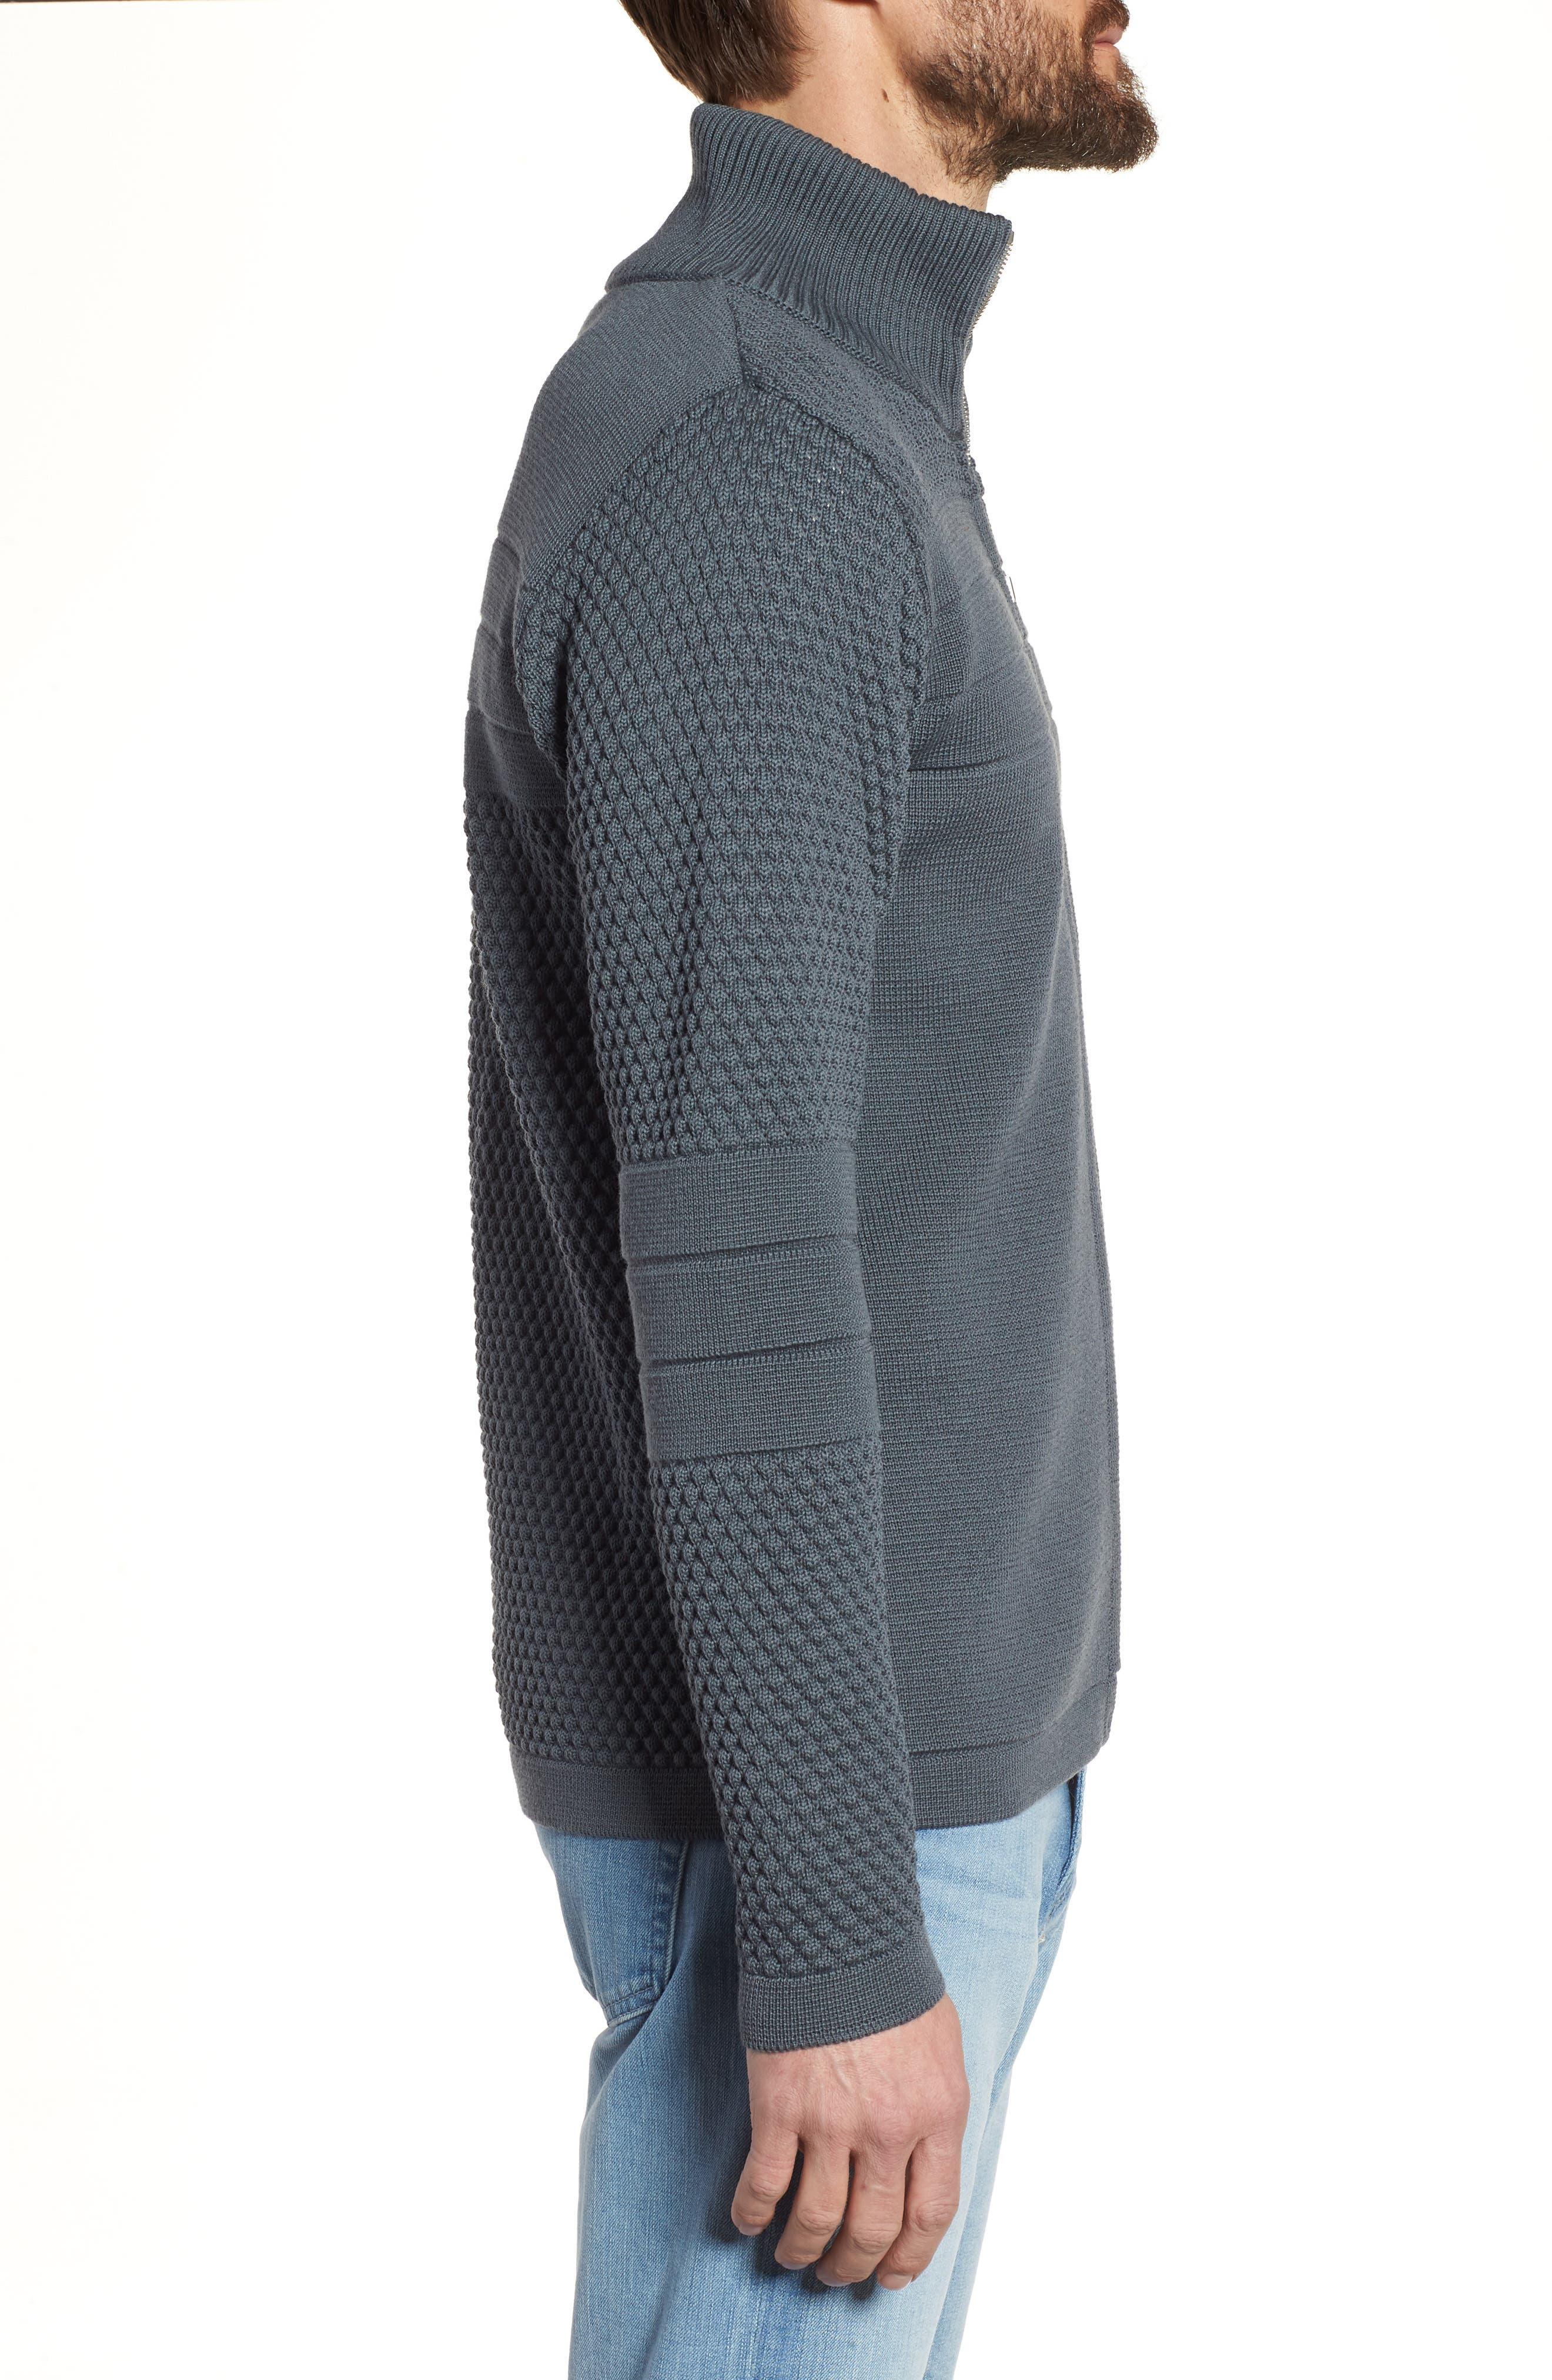 Torso Jacket,                             Alternate thumbnail 3, color,                             Uniform Grey